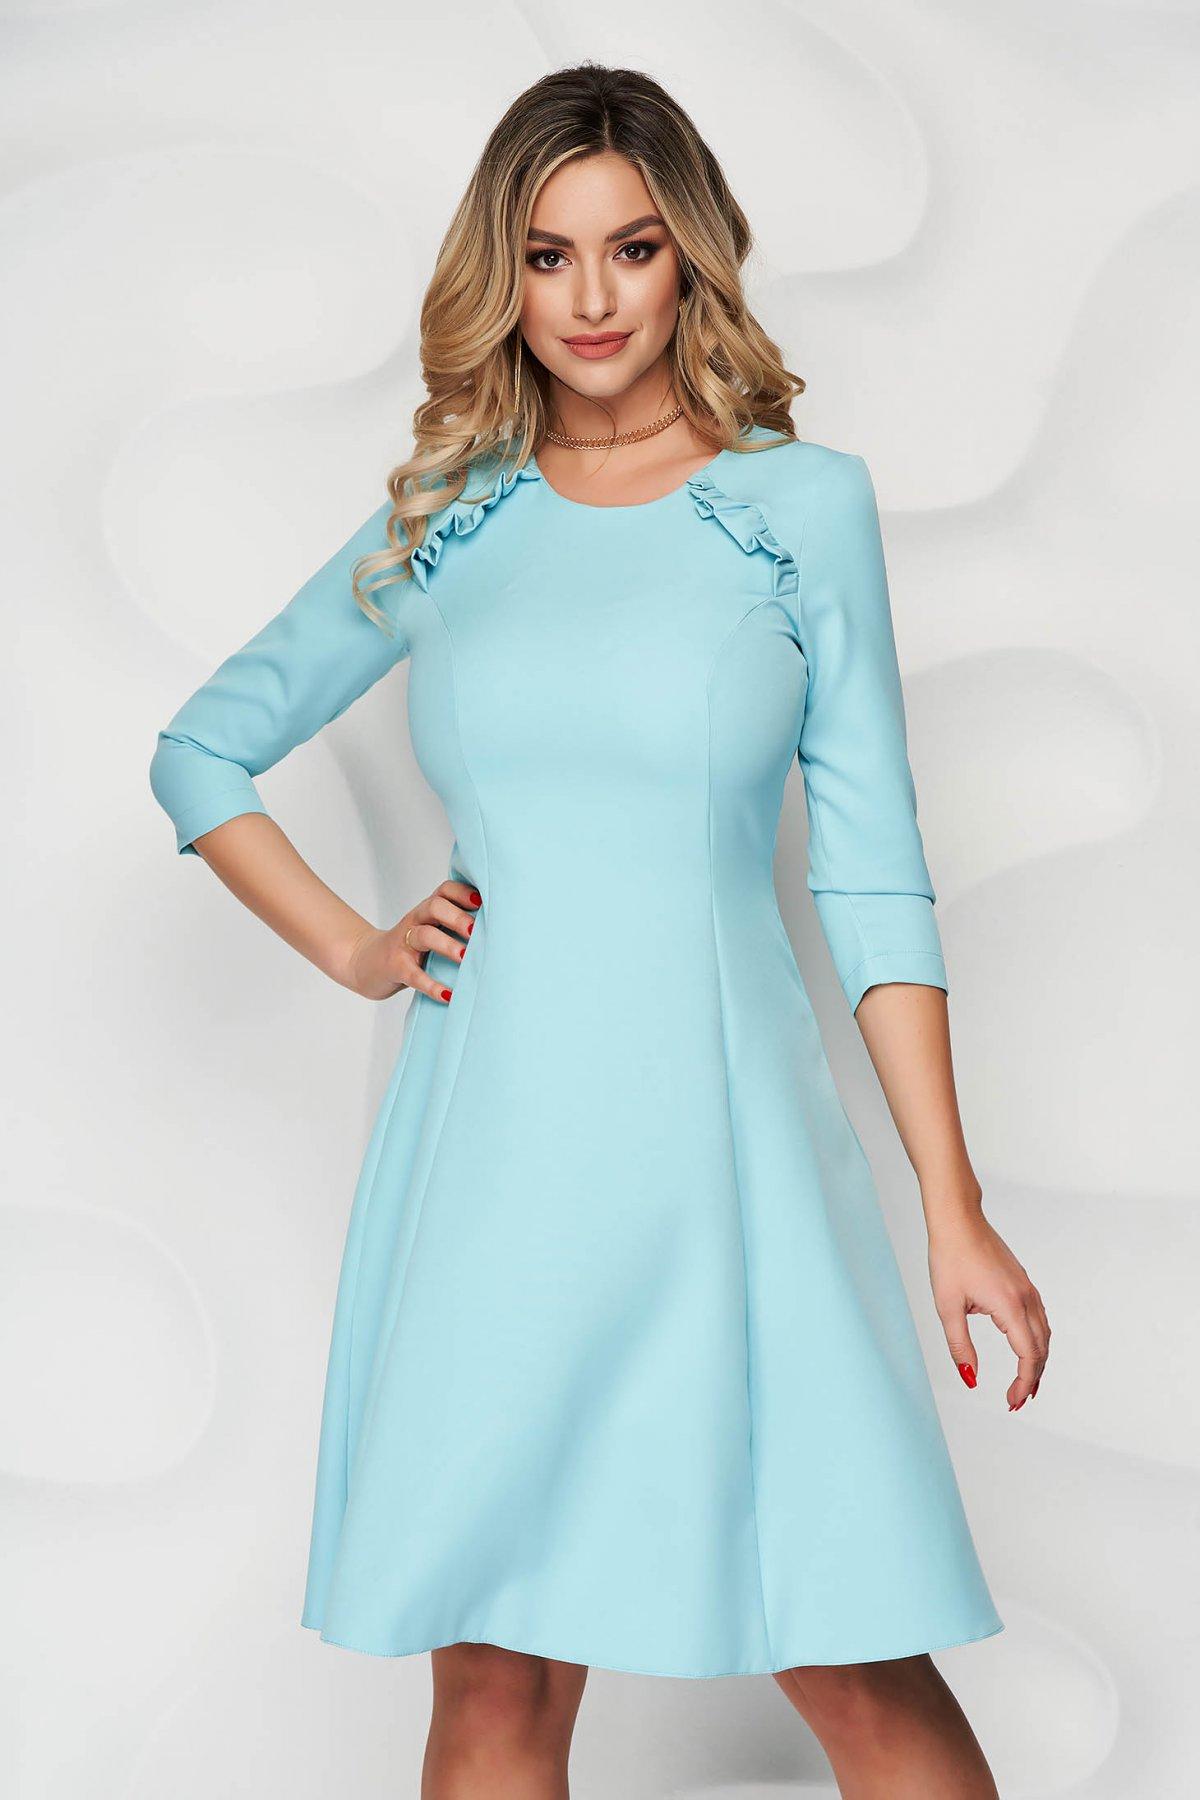 Rochie StarShinerS albastru aqua office midi in clos din stofa usor elastica cu volanase - medelin.ro